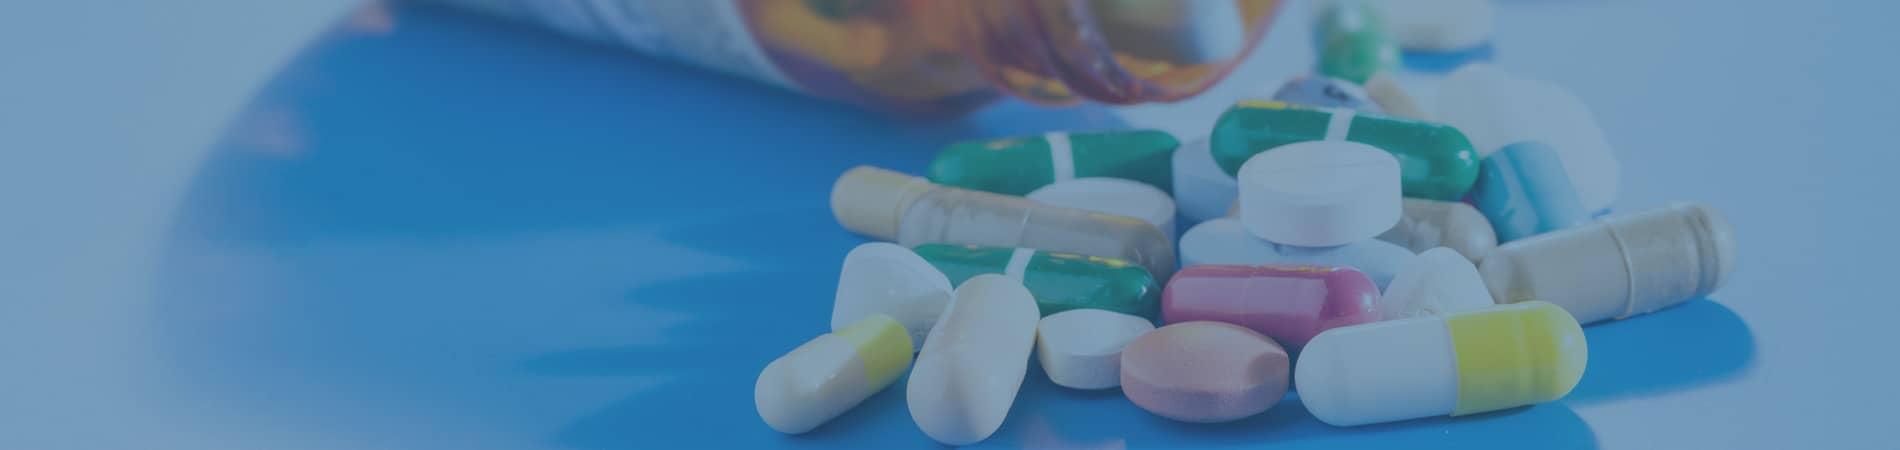 Pills Spilling Onto Table